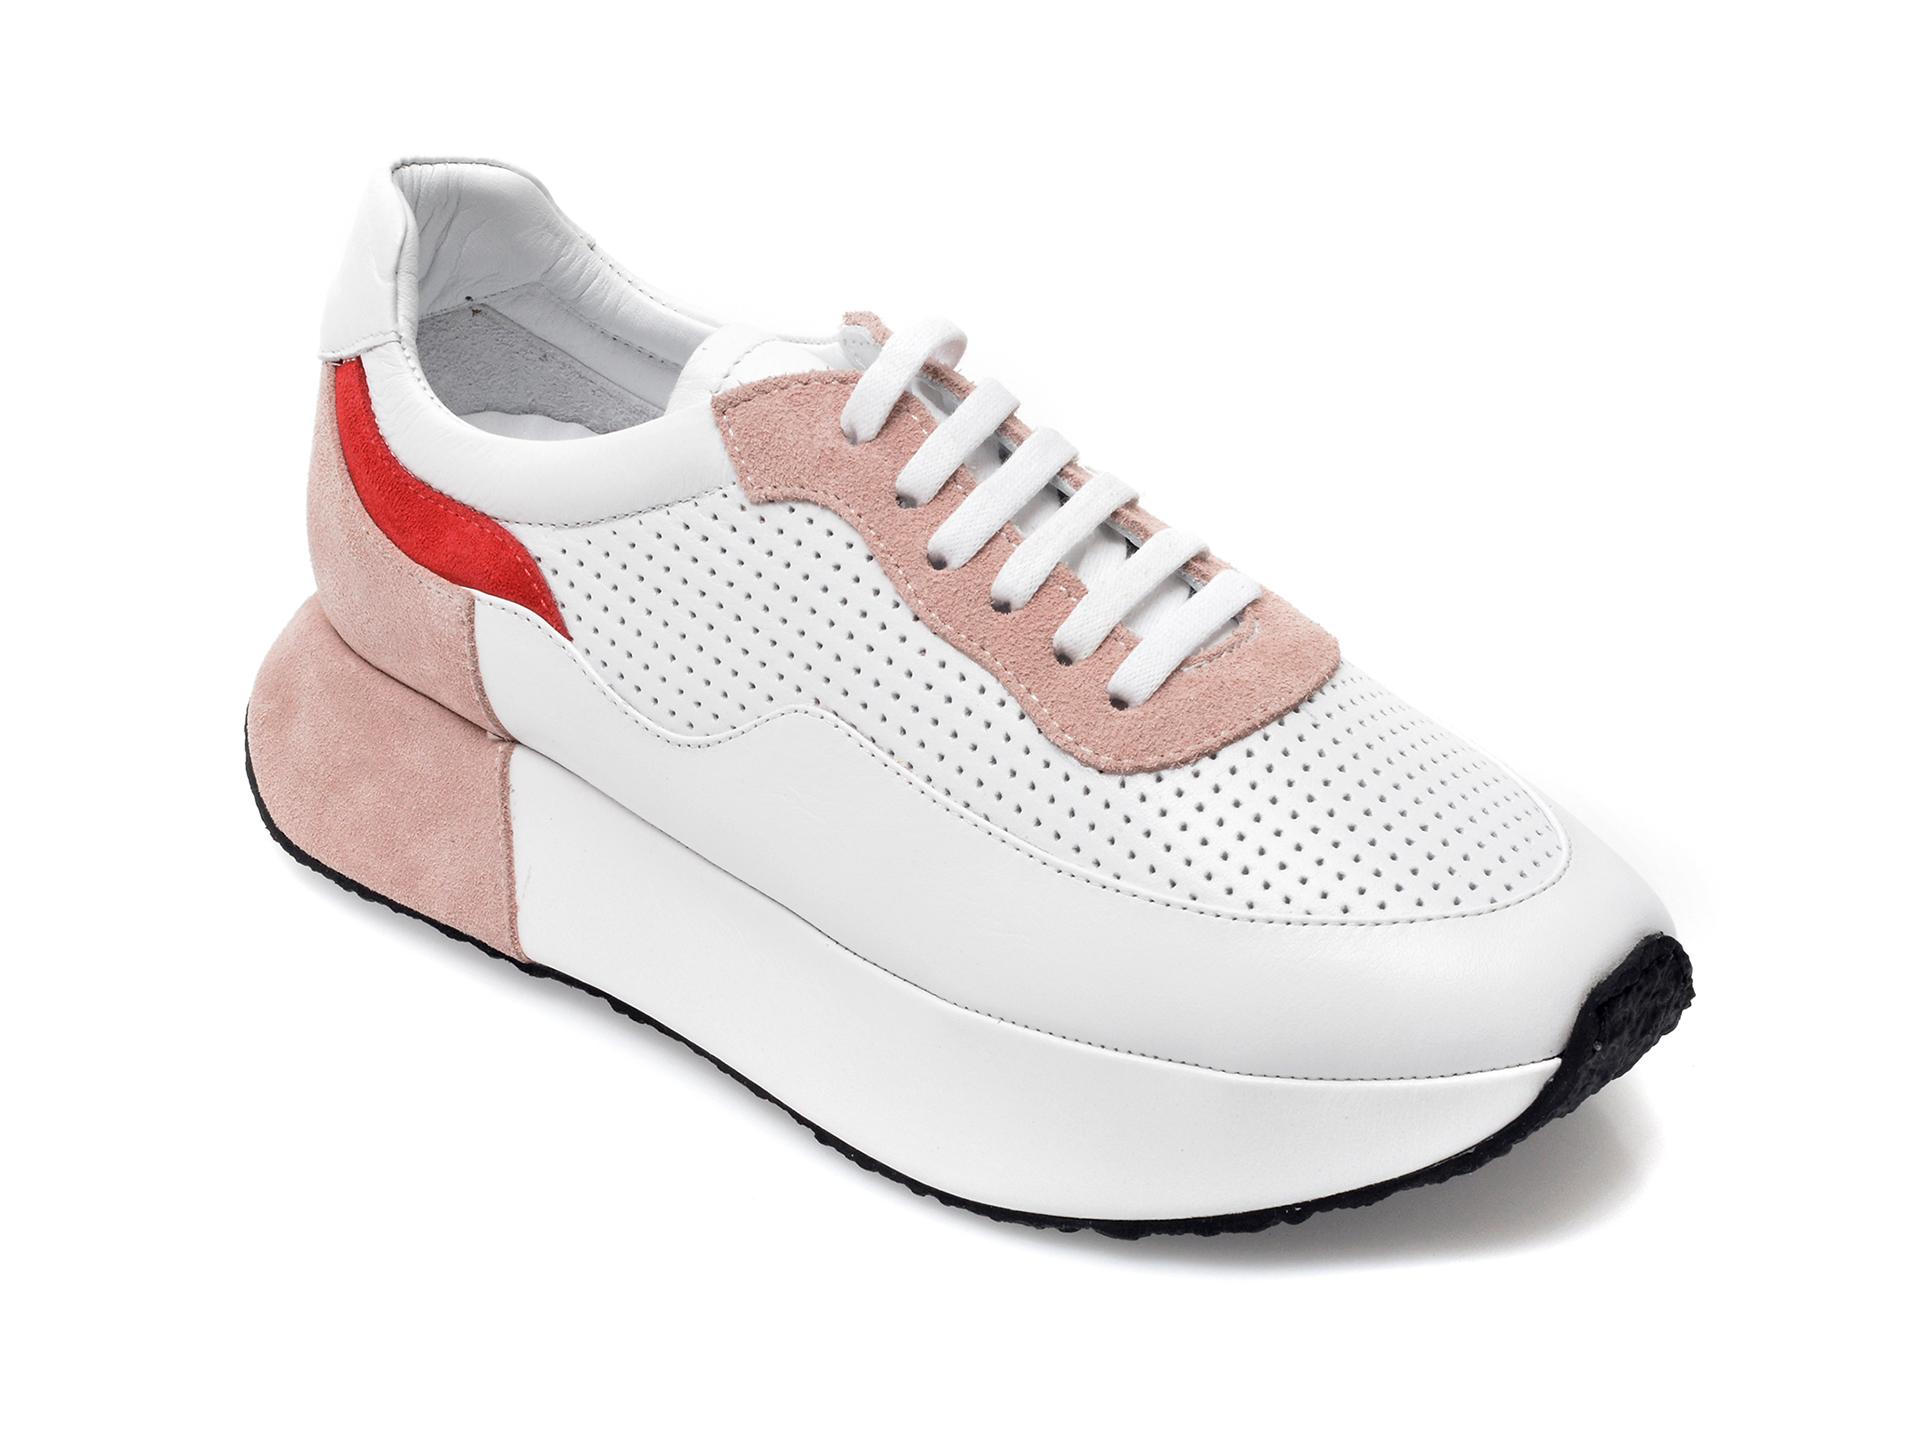 Pantofi sport EPICA albi, 851129, din piele naturala imagine otter.ro 2021